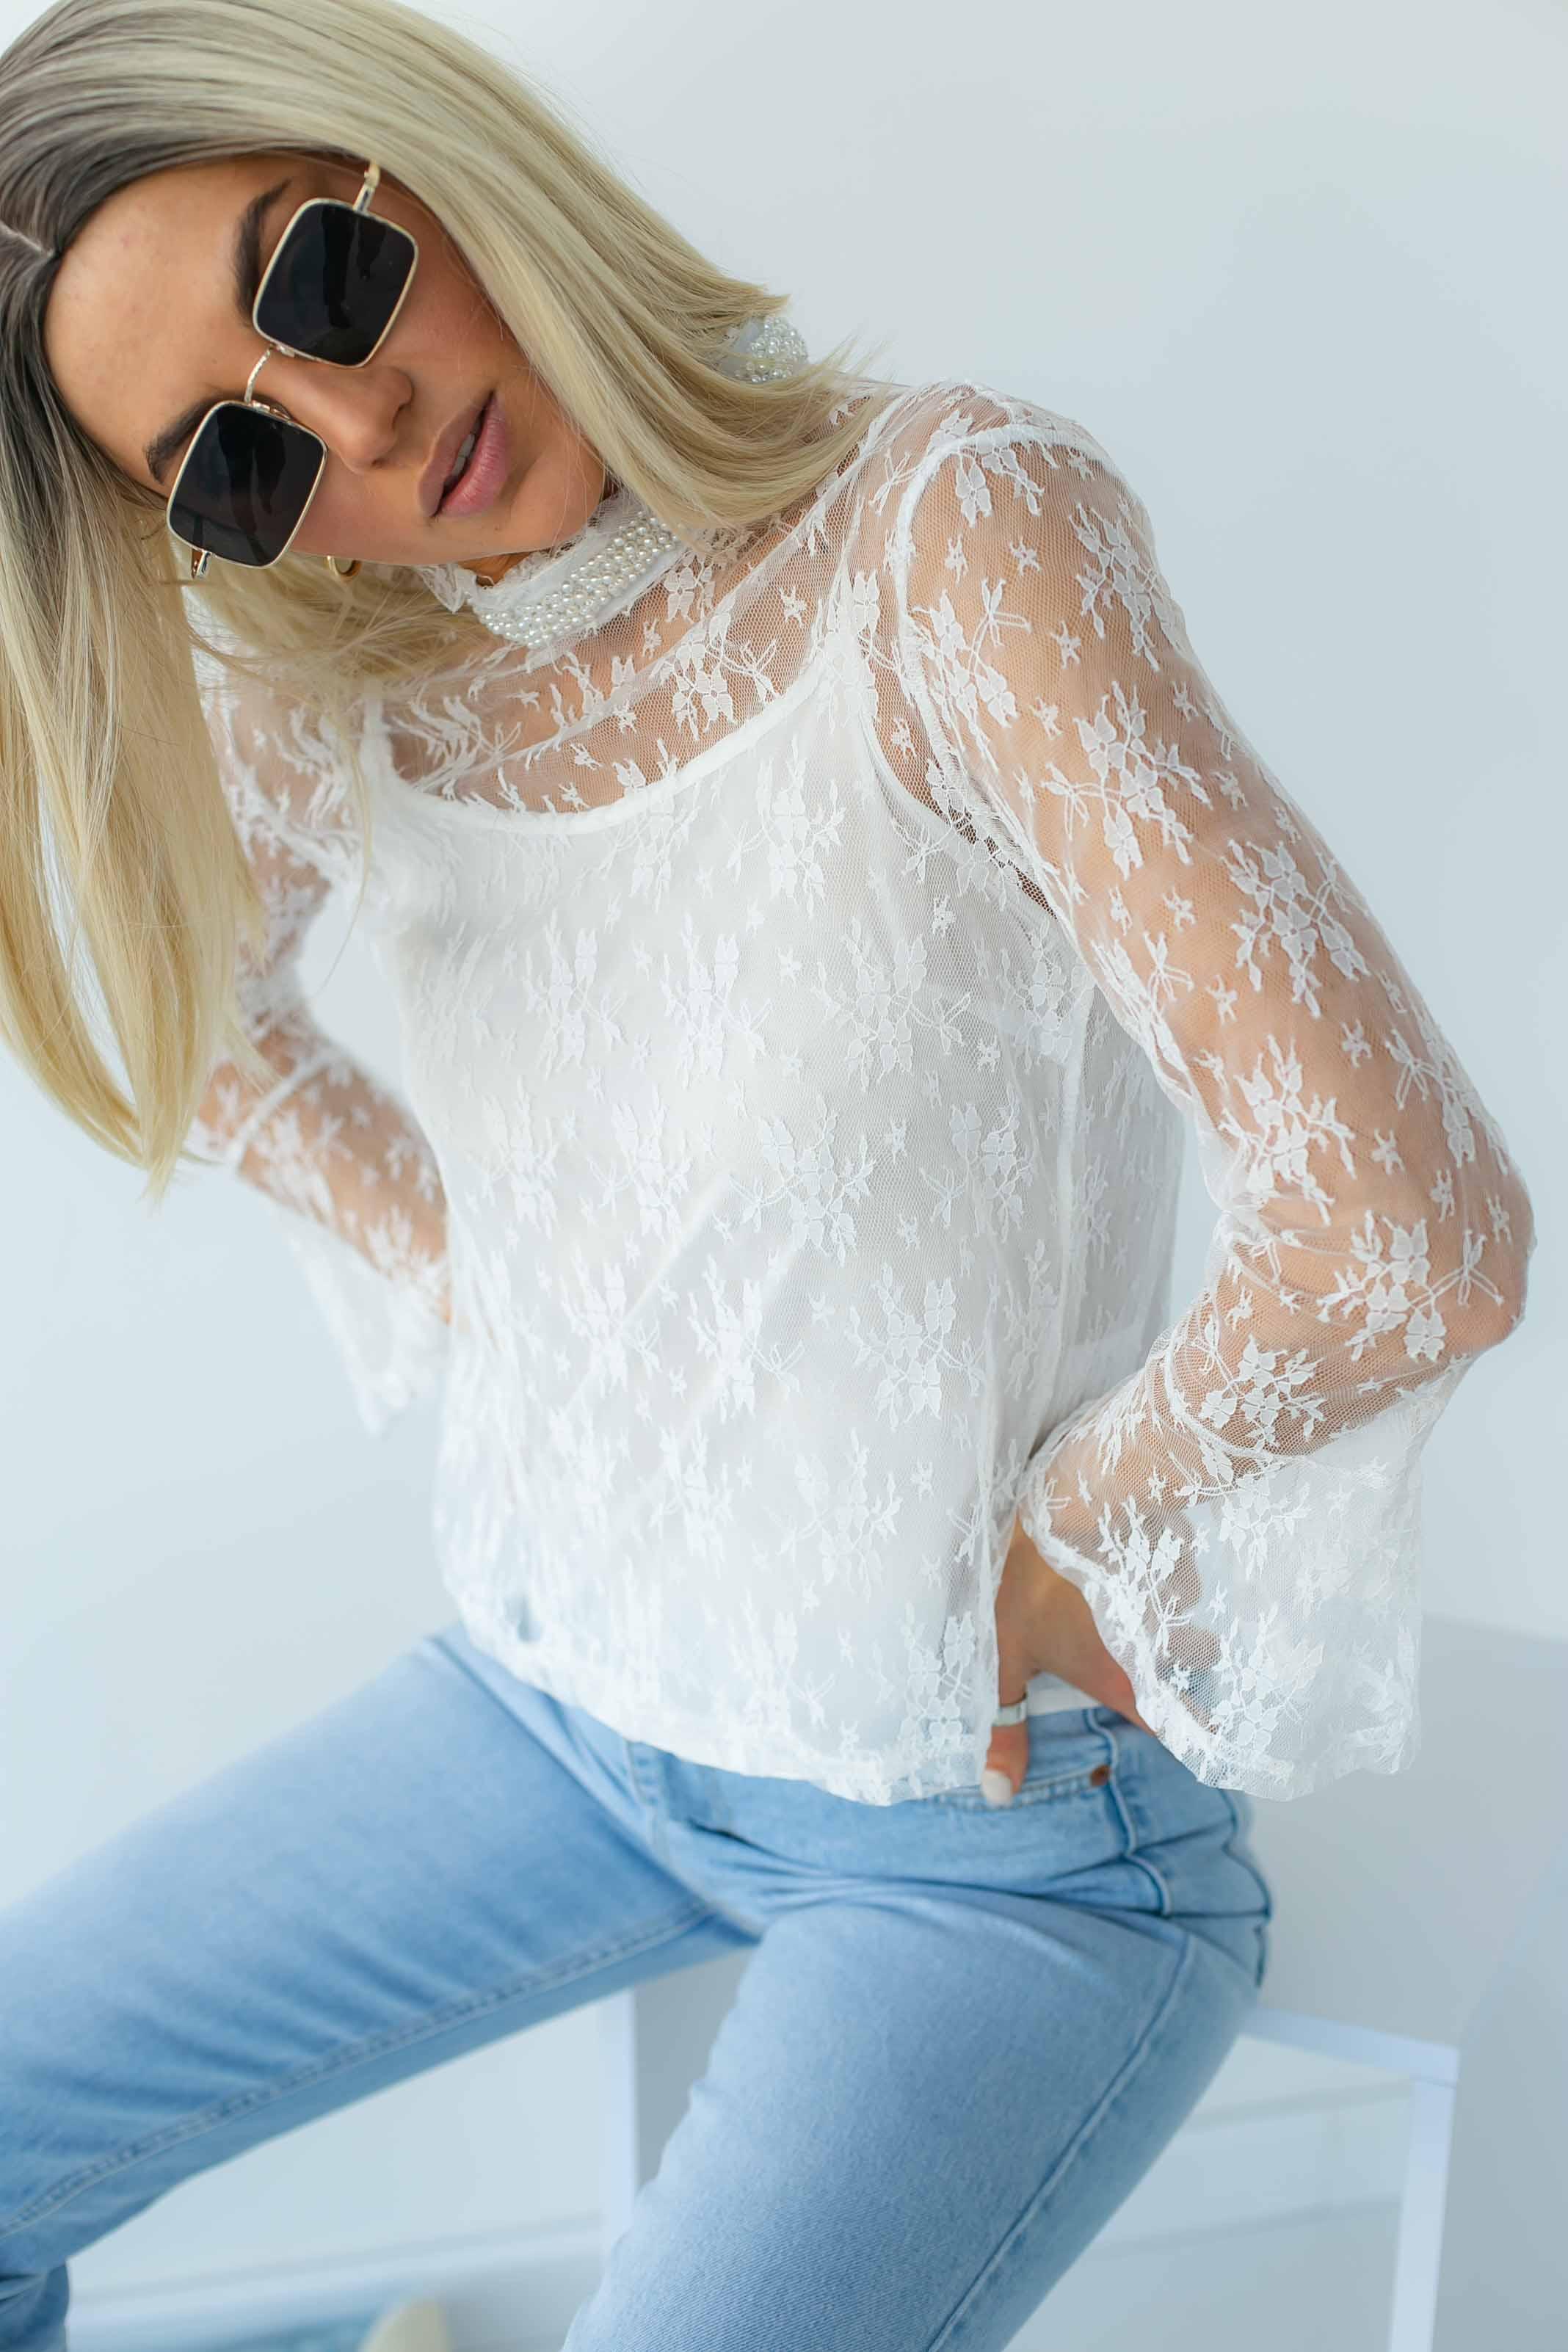 Кружевная блуза в стиле ампир Paccio - белый цвет